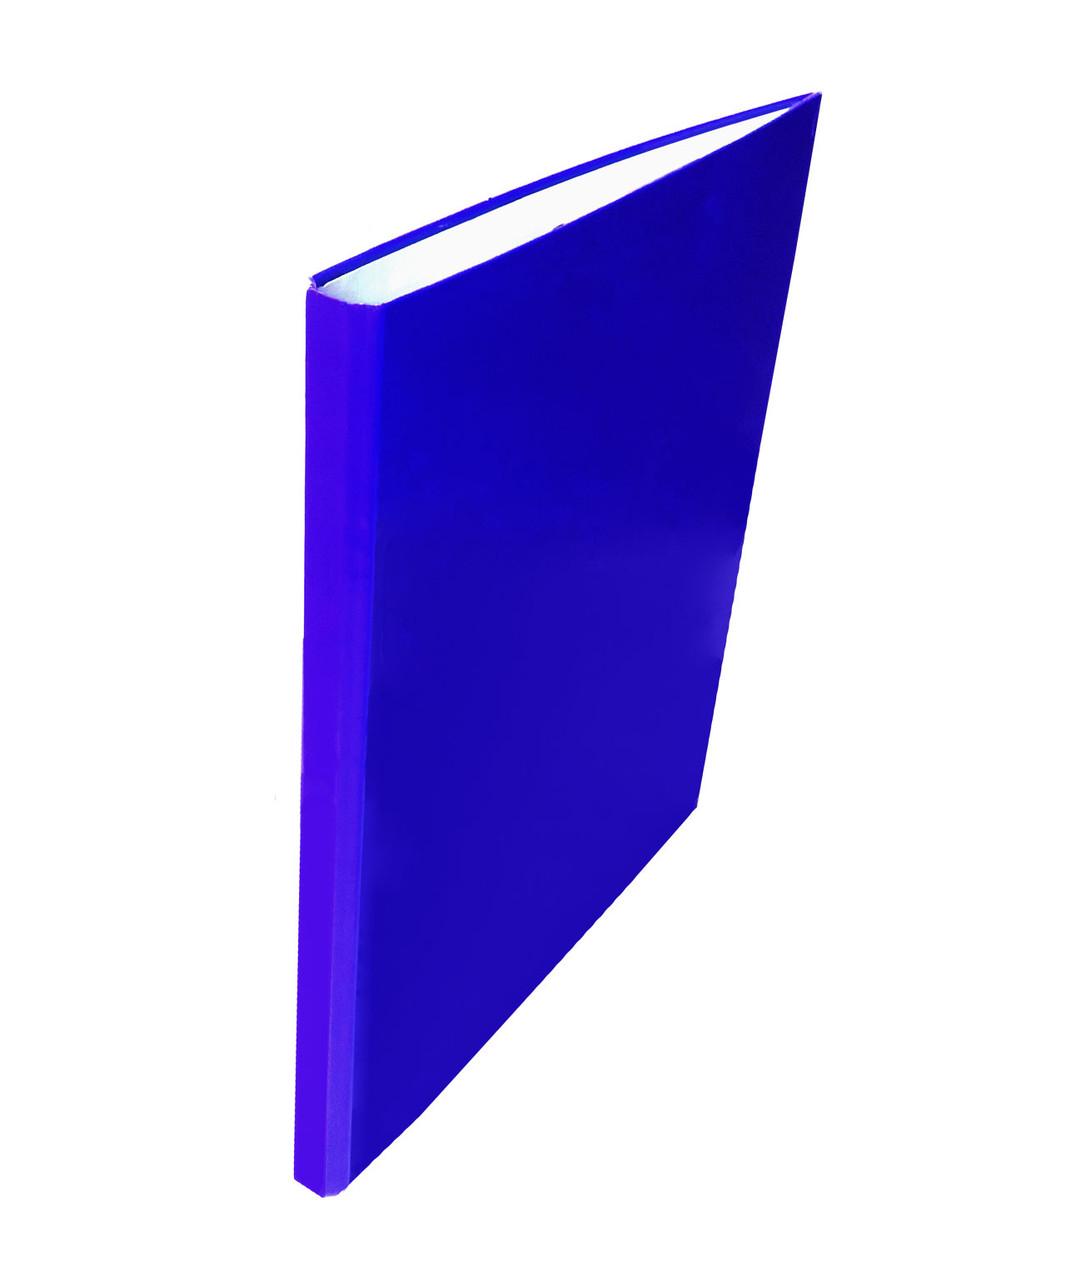 Папка с зажимом Clipboard, А5, 20 мм, PP-покрытие